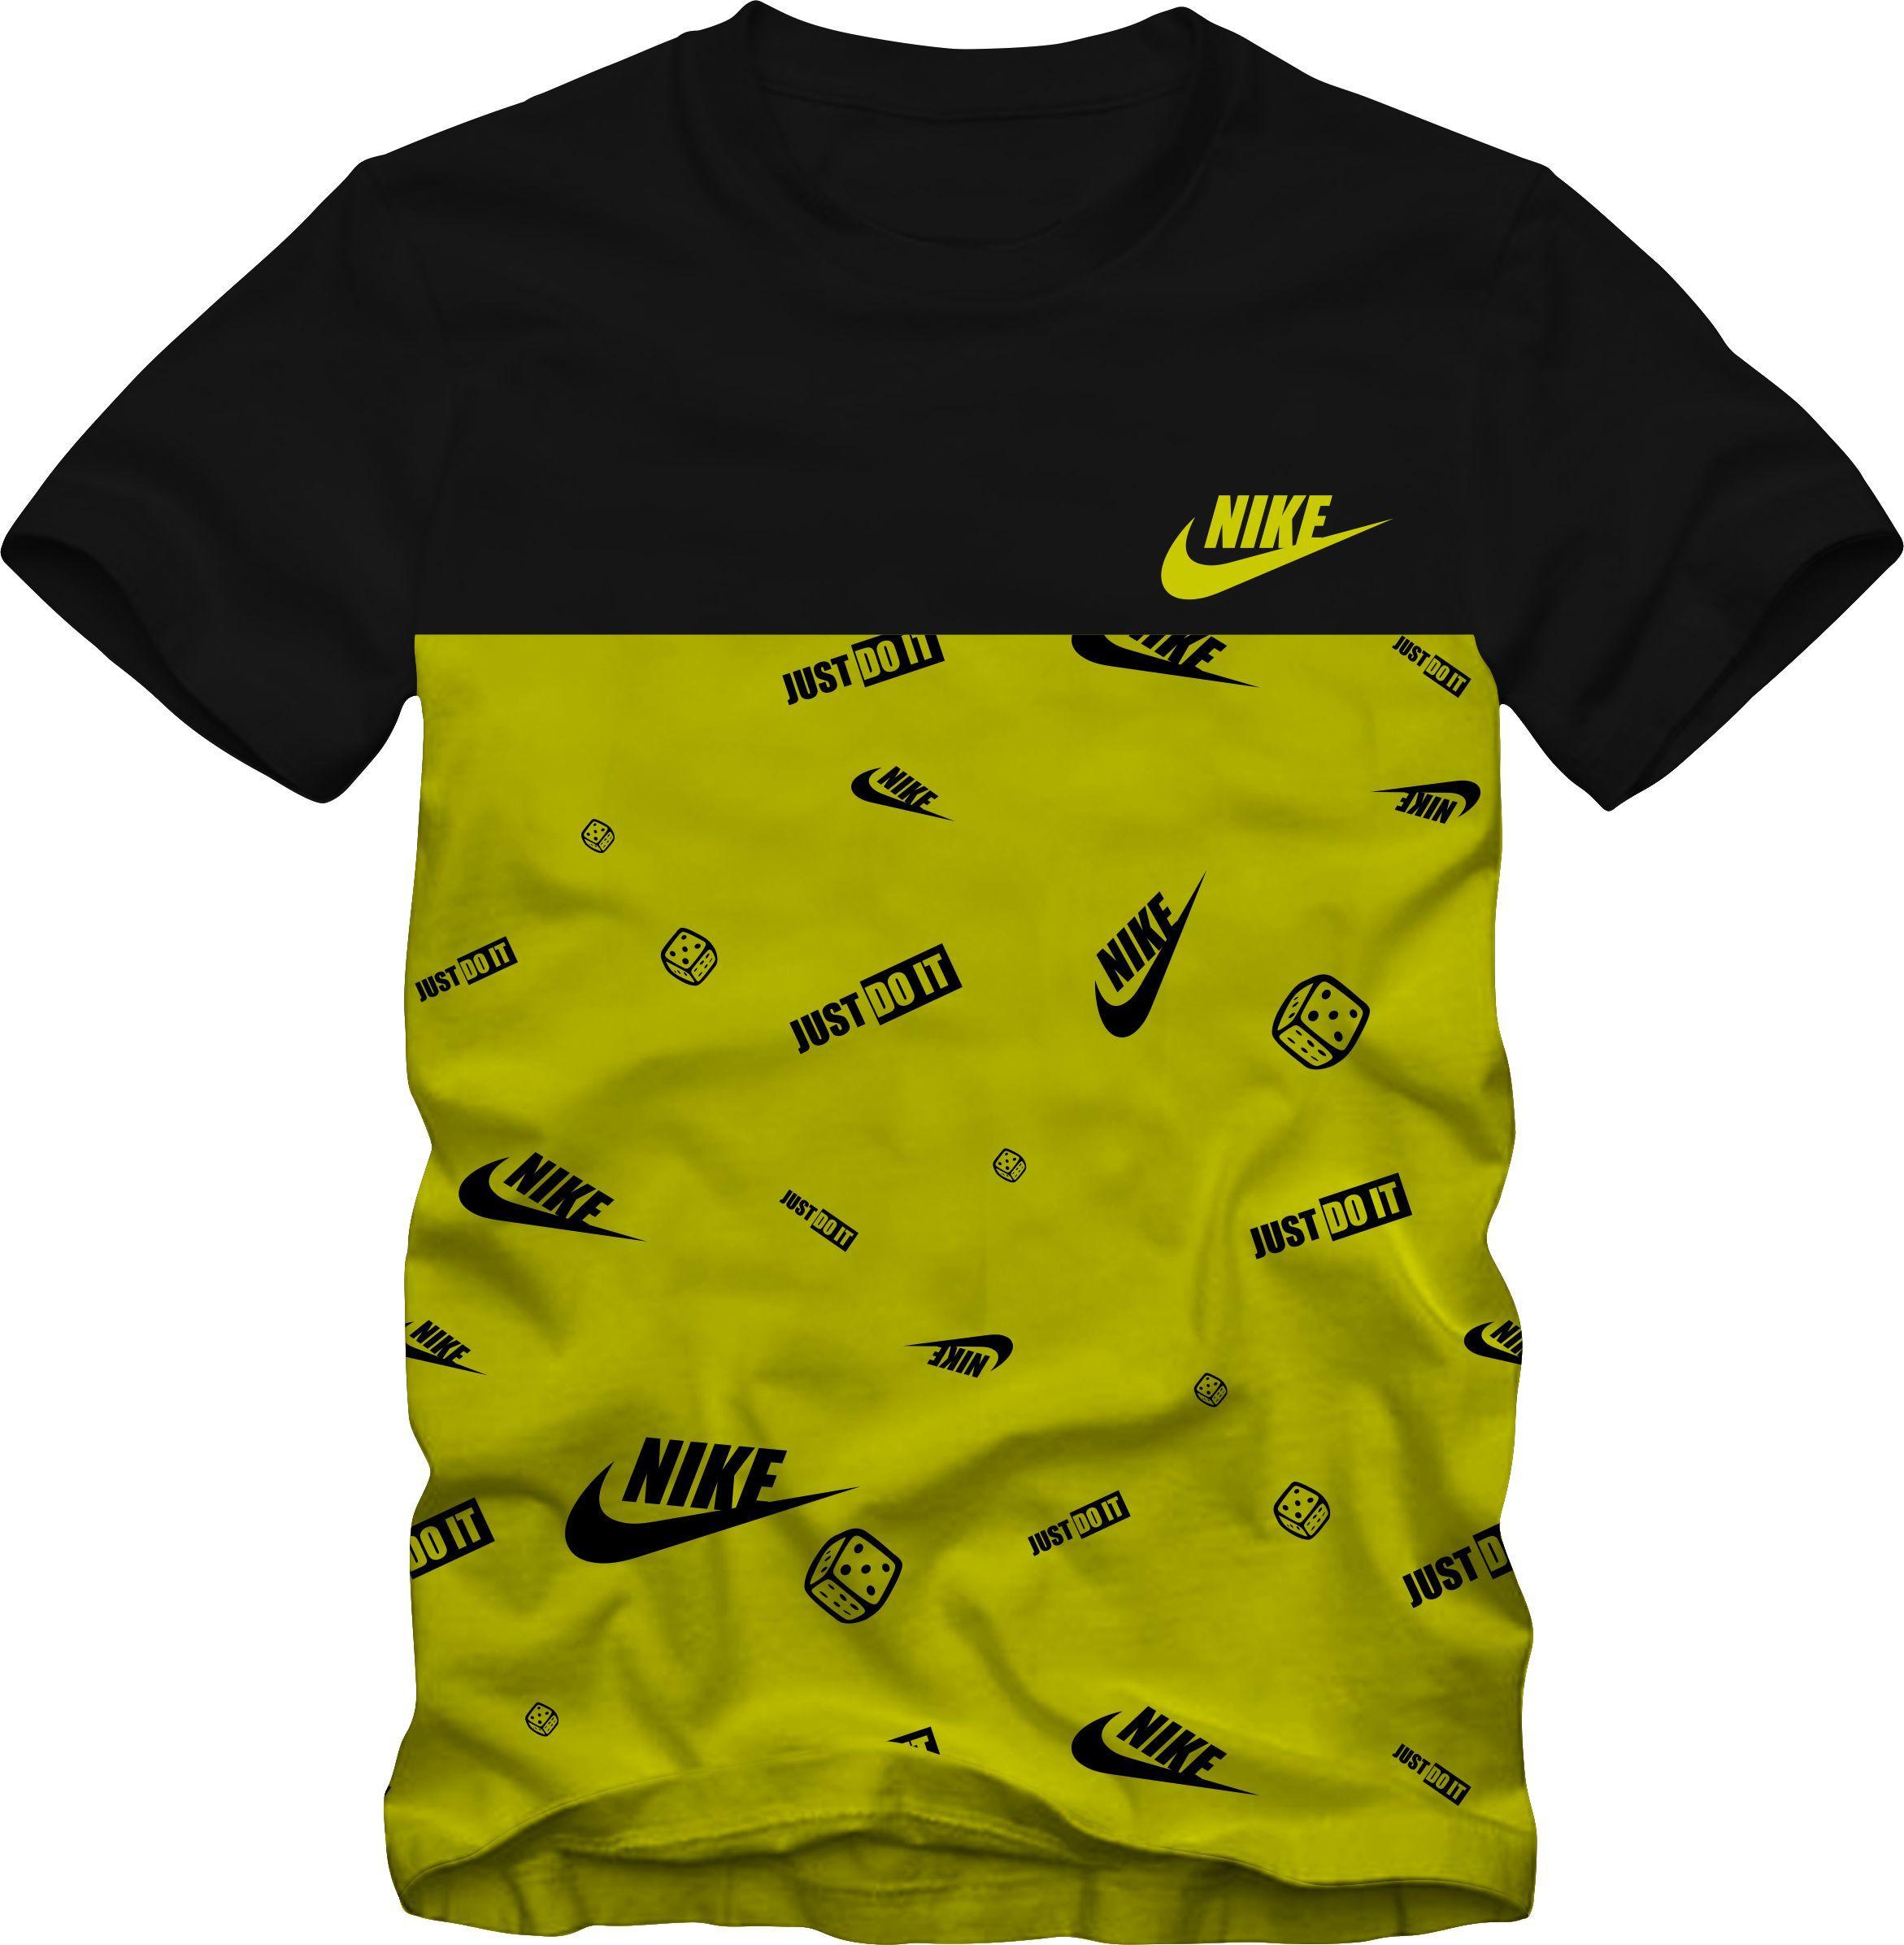 T-shirt #volcom #adidas #billabong #ripcurl #nike